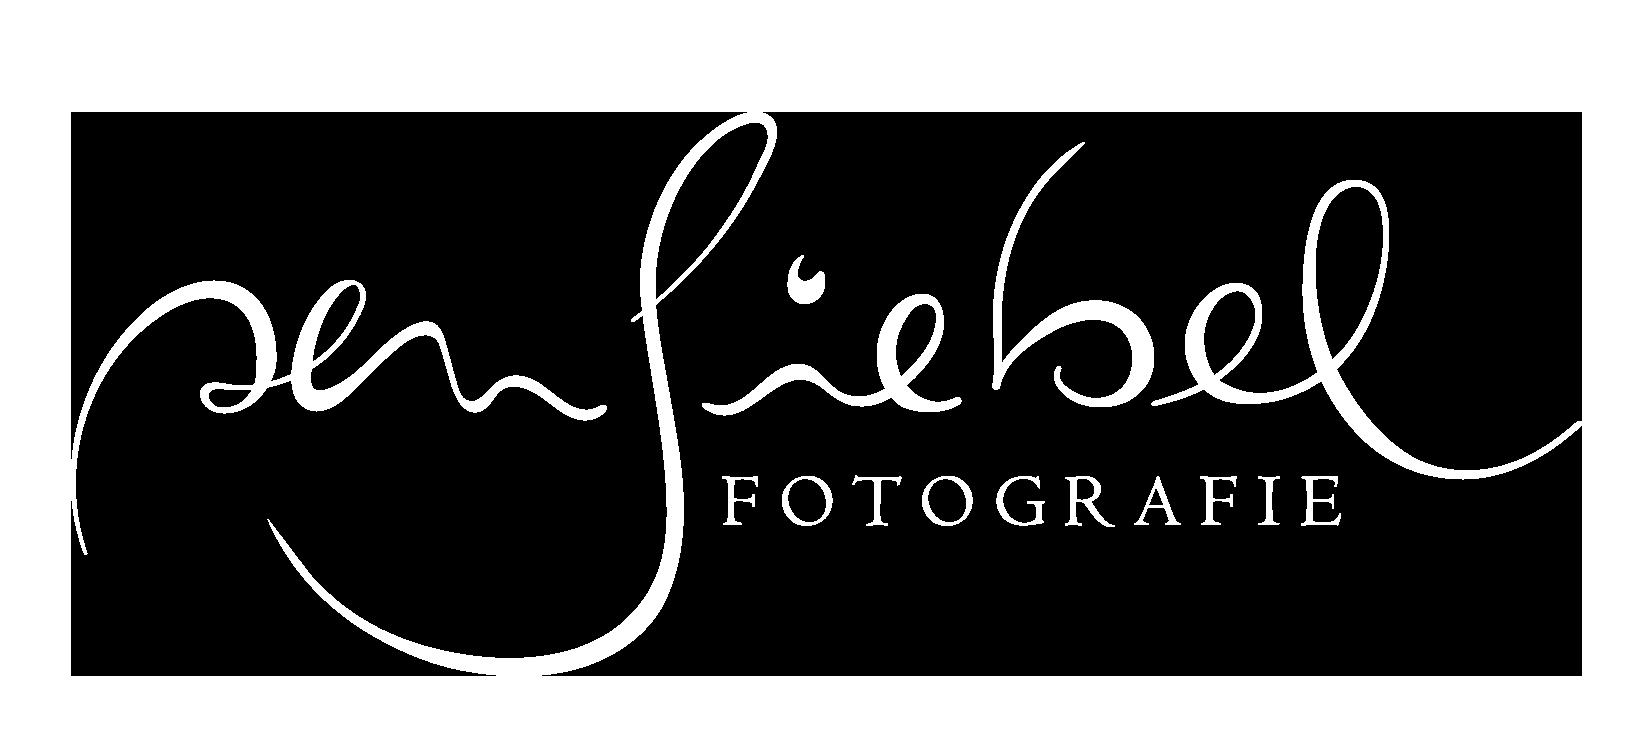 Sensiebel Fotografie - Tierfotografie im Allgäu